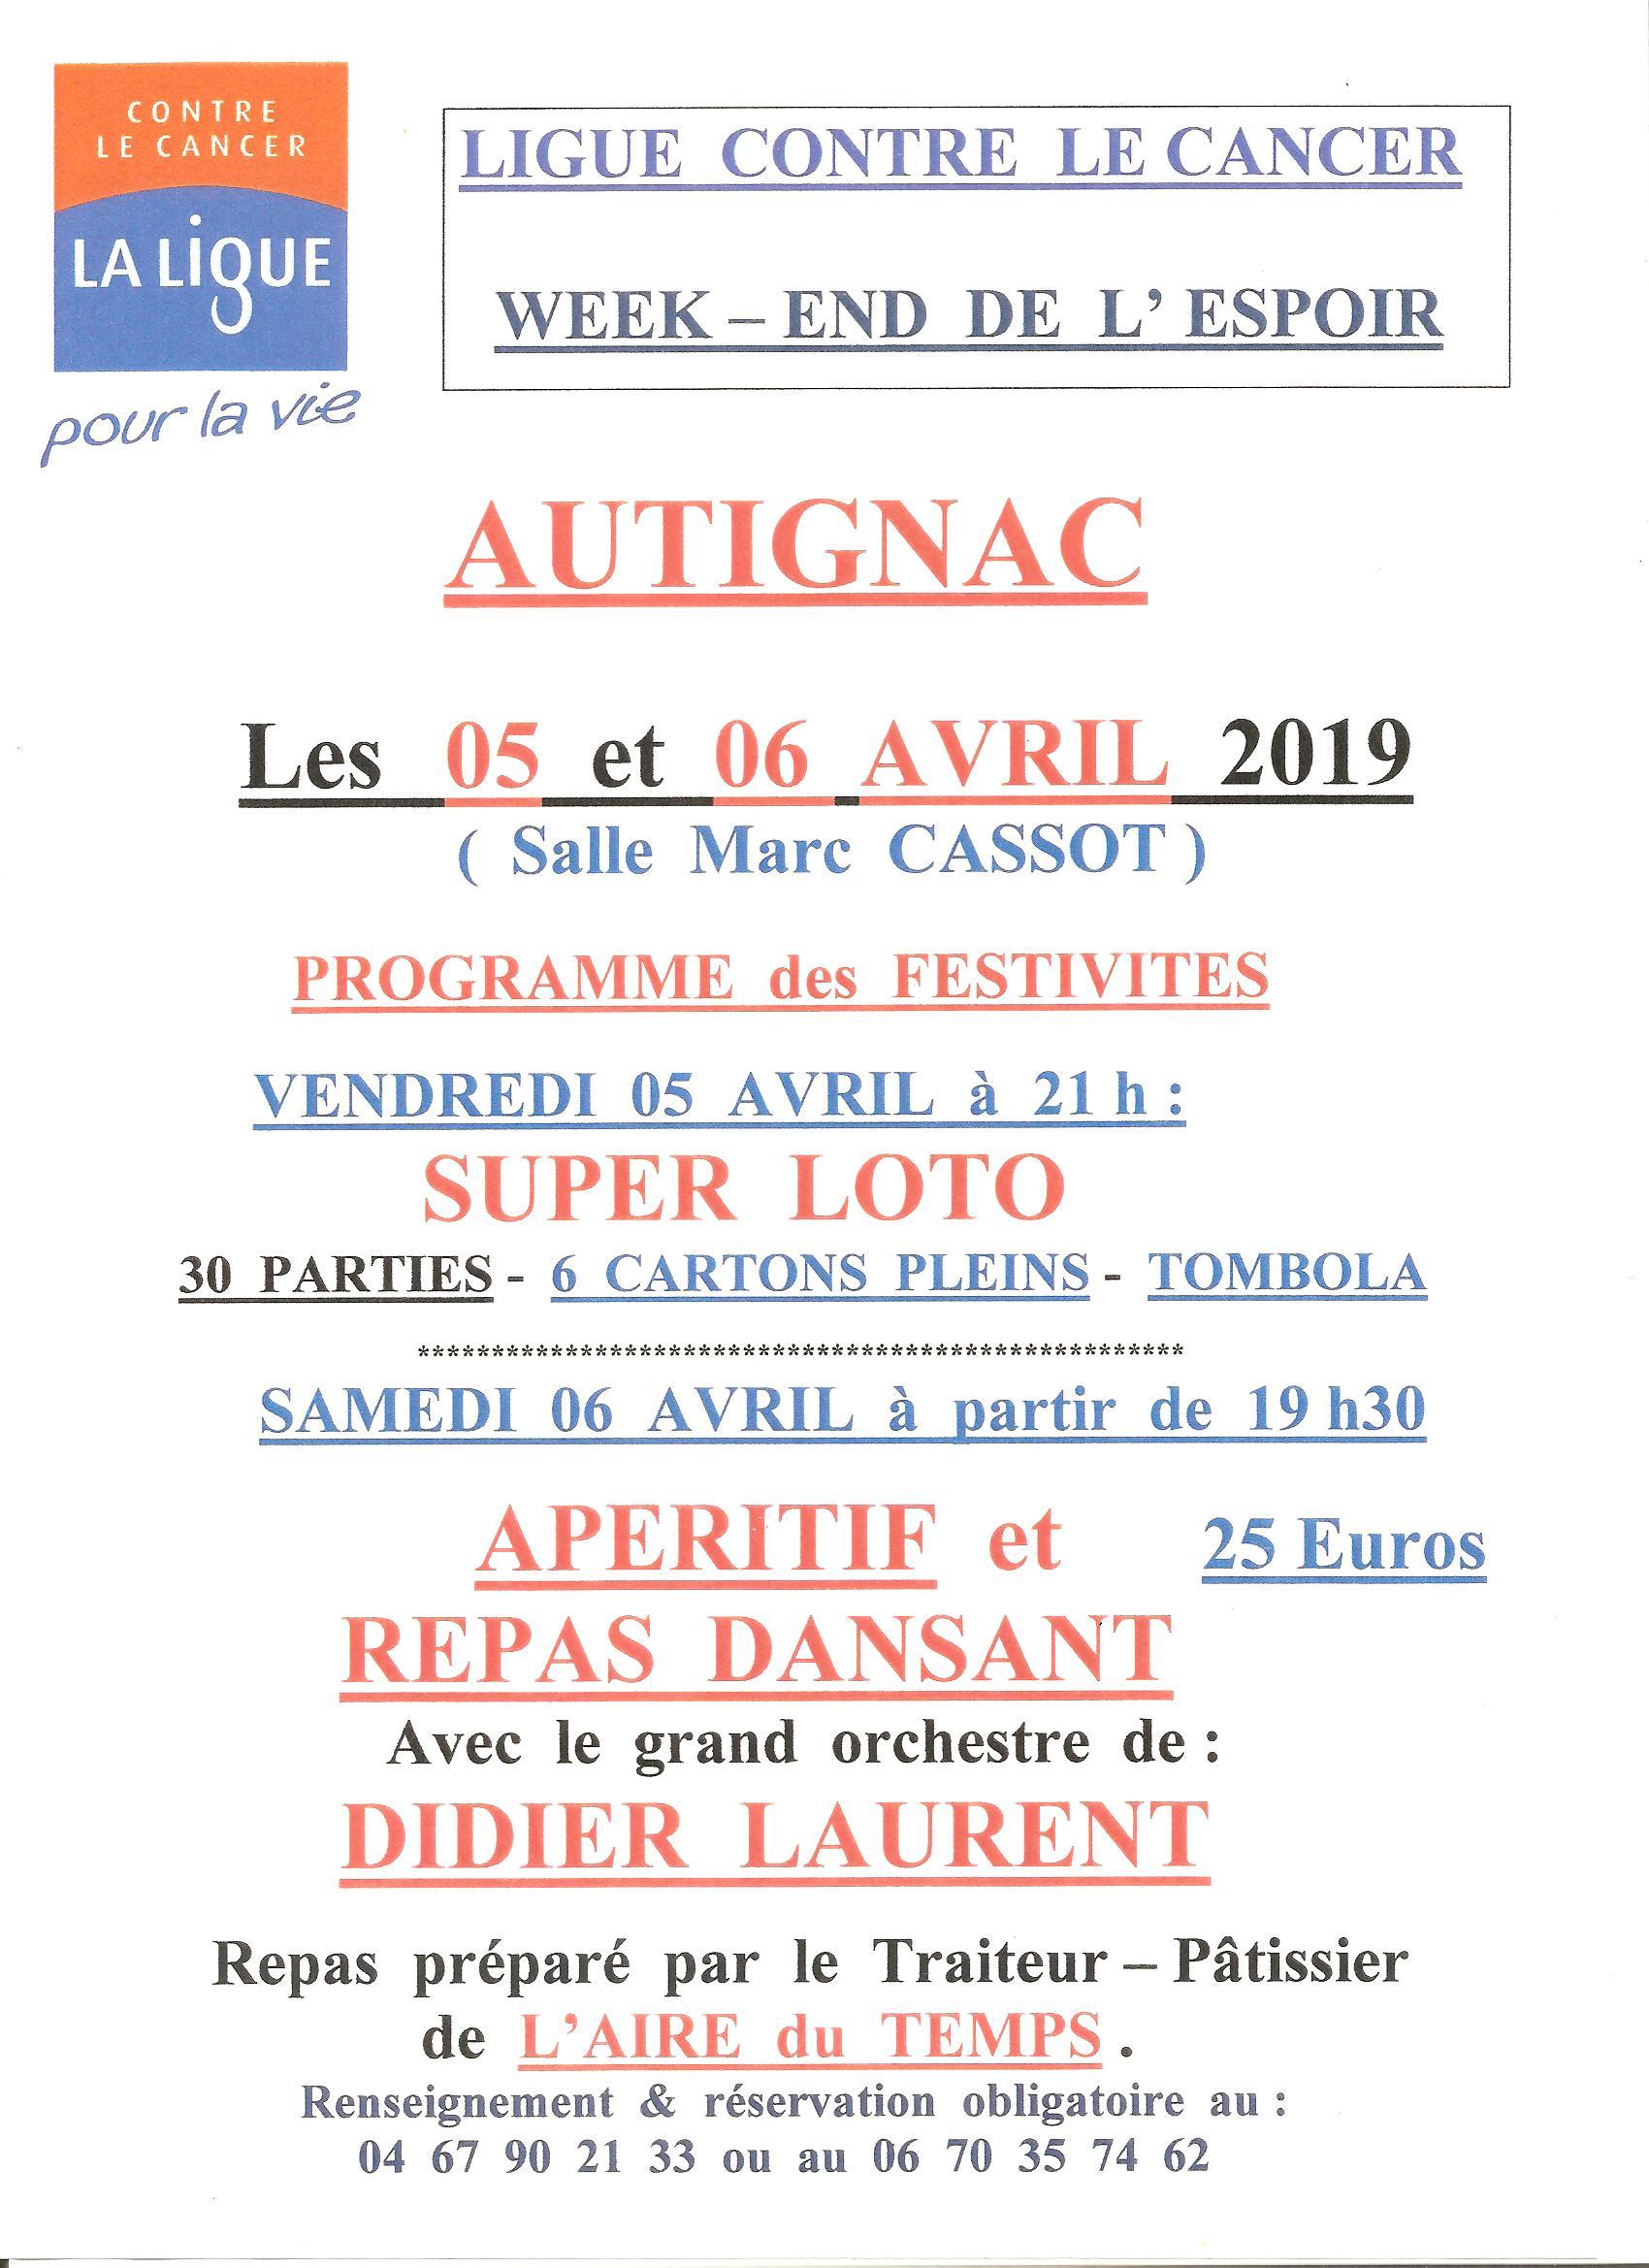 cancer week end espoir 2019